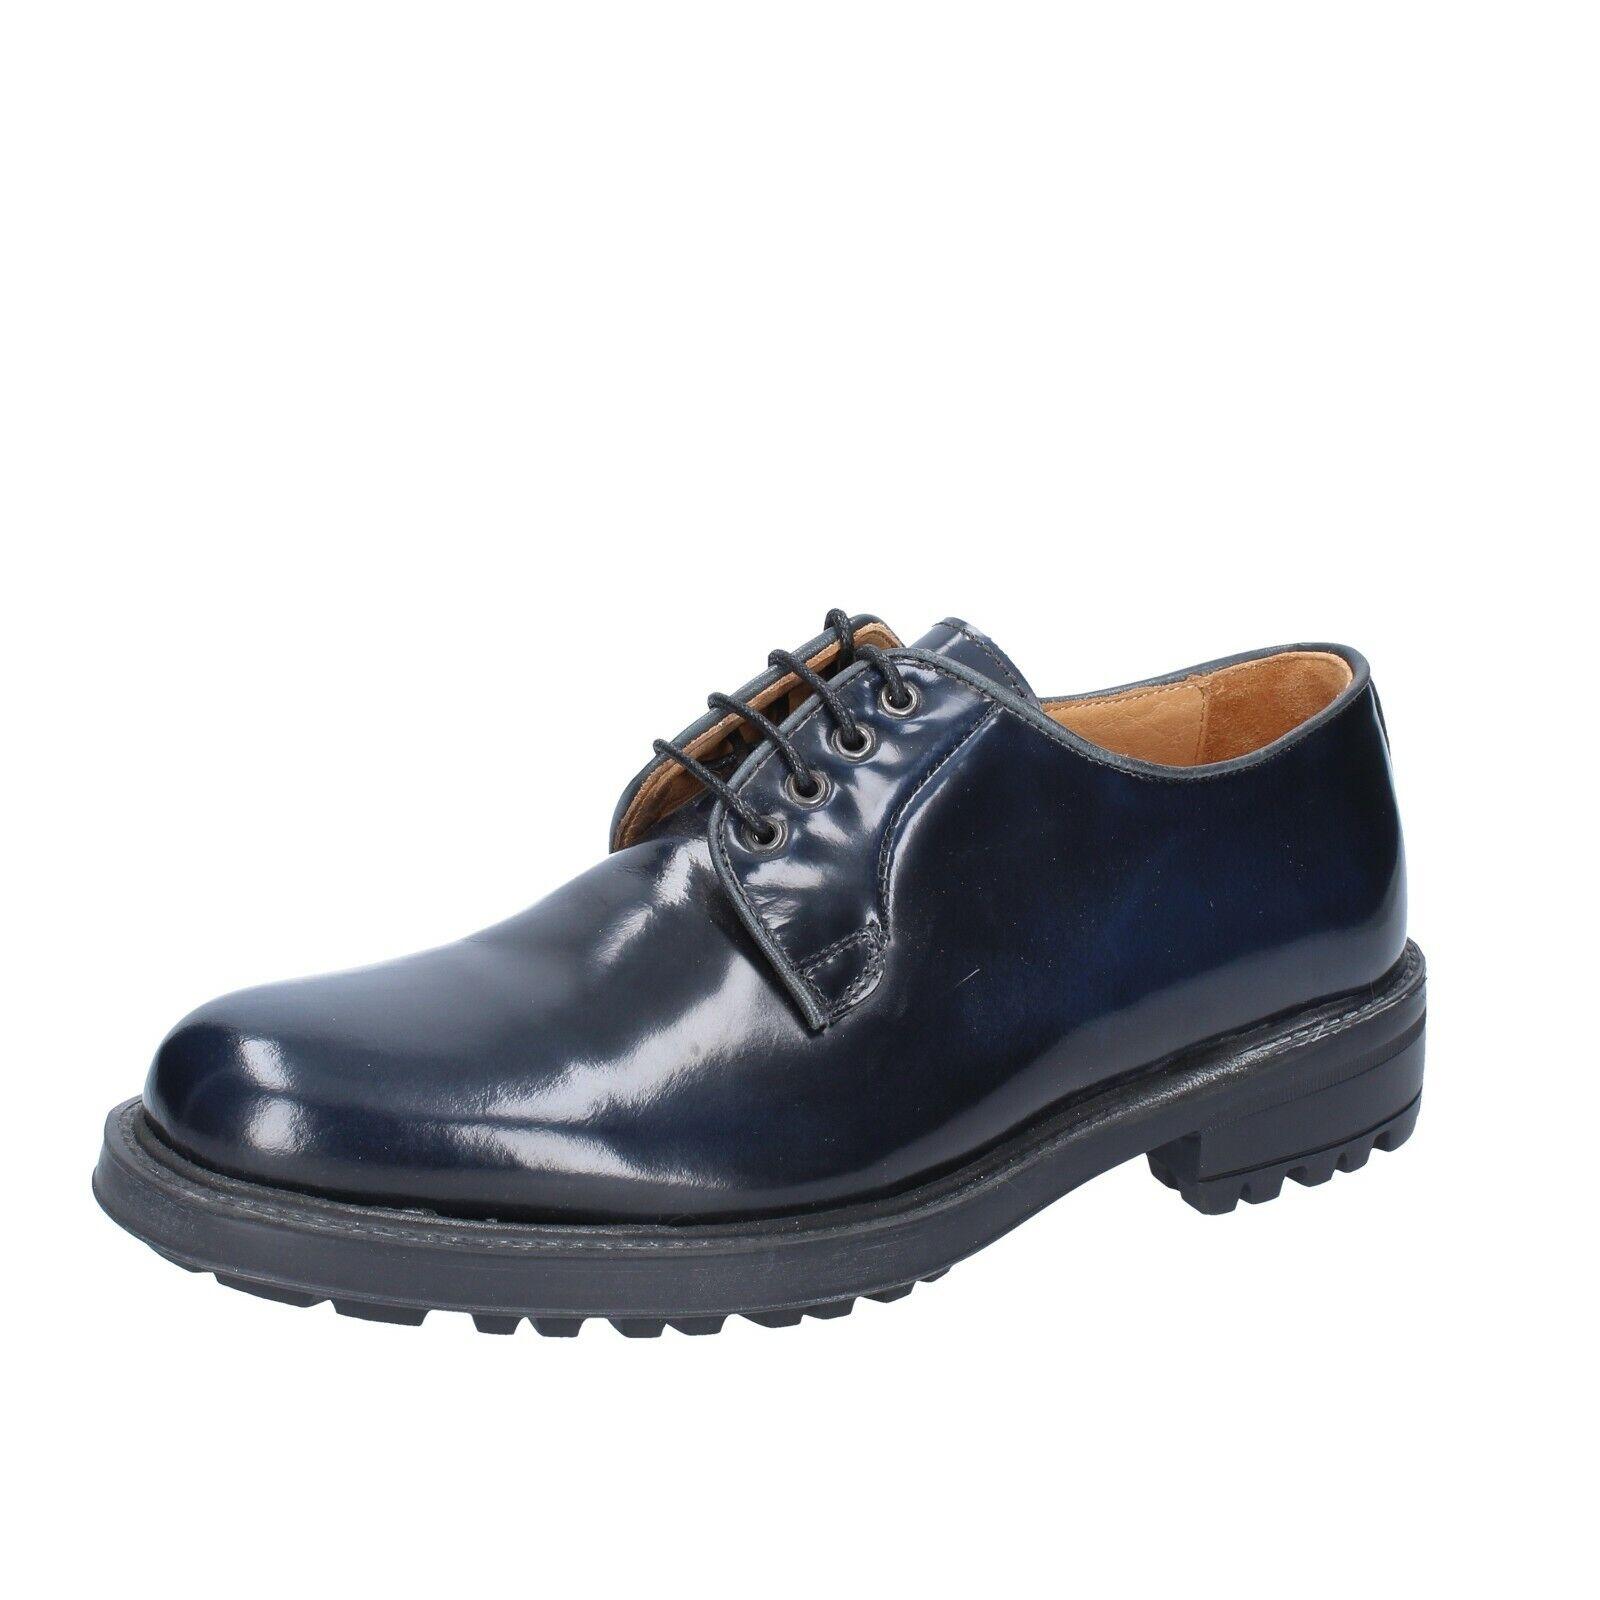 Zapatos caballero zapatos Zenith 39 UE elegante azul brillante cuero bs619